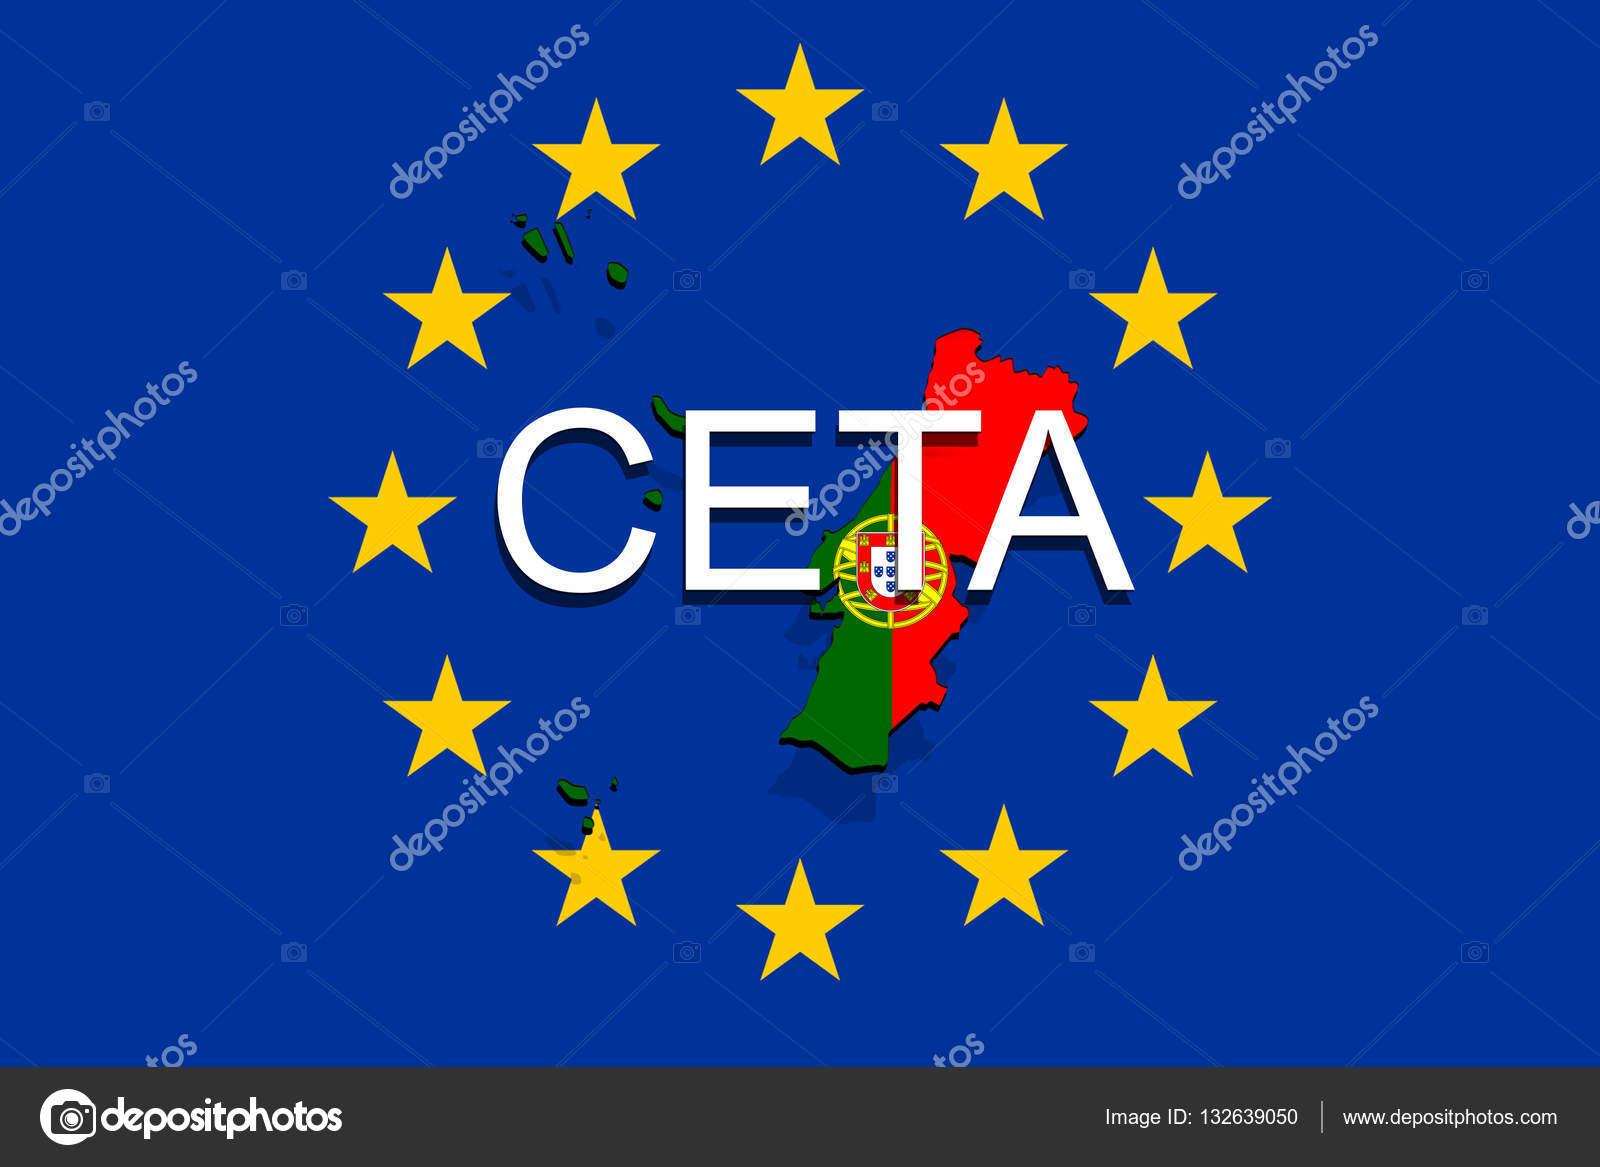 Ceta comprehensive economic and trade agreement on euro union ceta comprehensive economic and trade agreement on euro union background portugal map photo by trybex platinumwayz